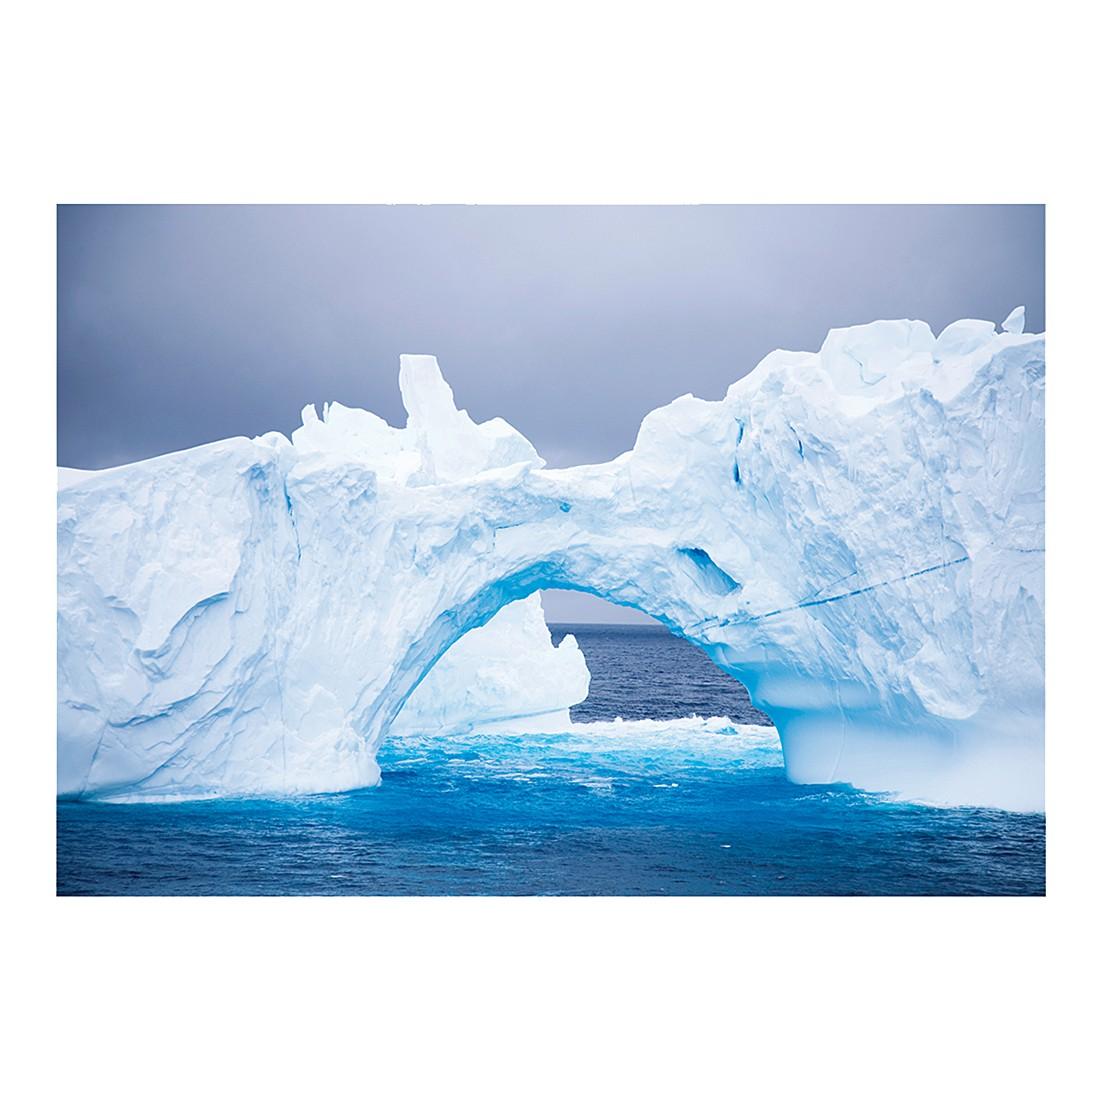 Fototapete Arc Of Ice, Mantiburi jetzt bestellen